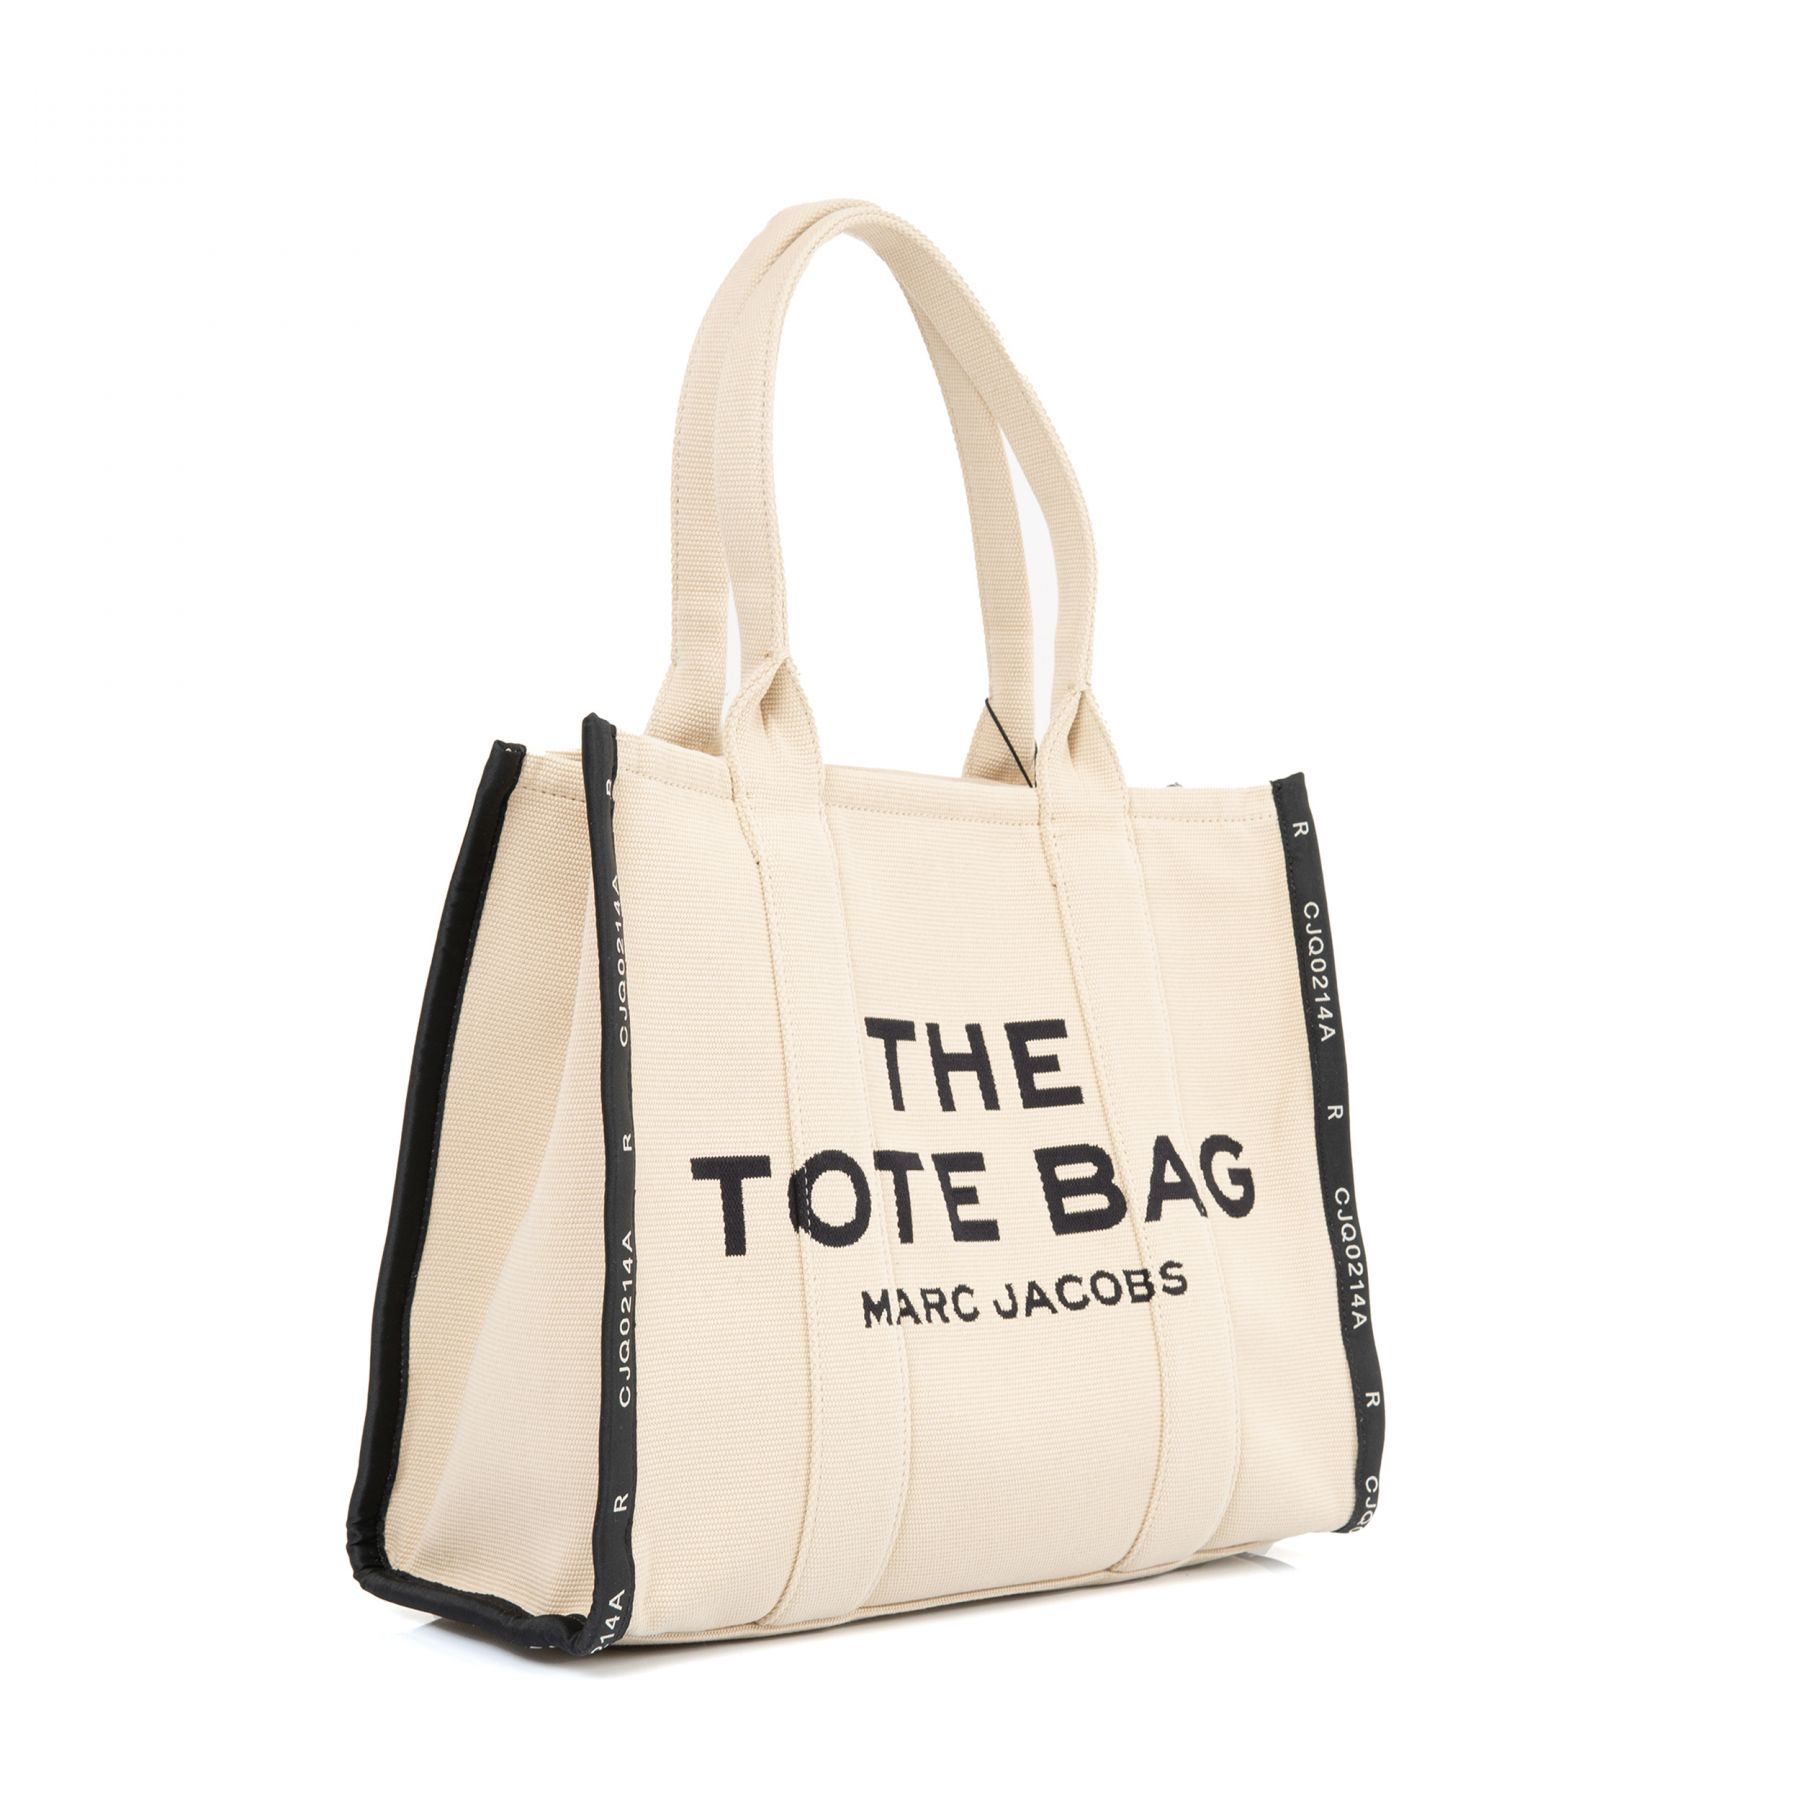 Сумка Marc Jacobs THE TOTE BAG светло-бежевая